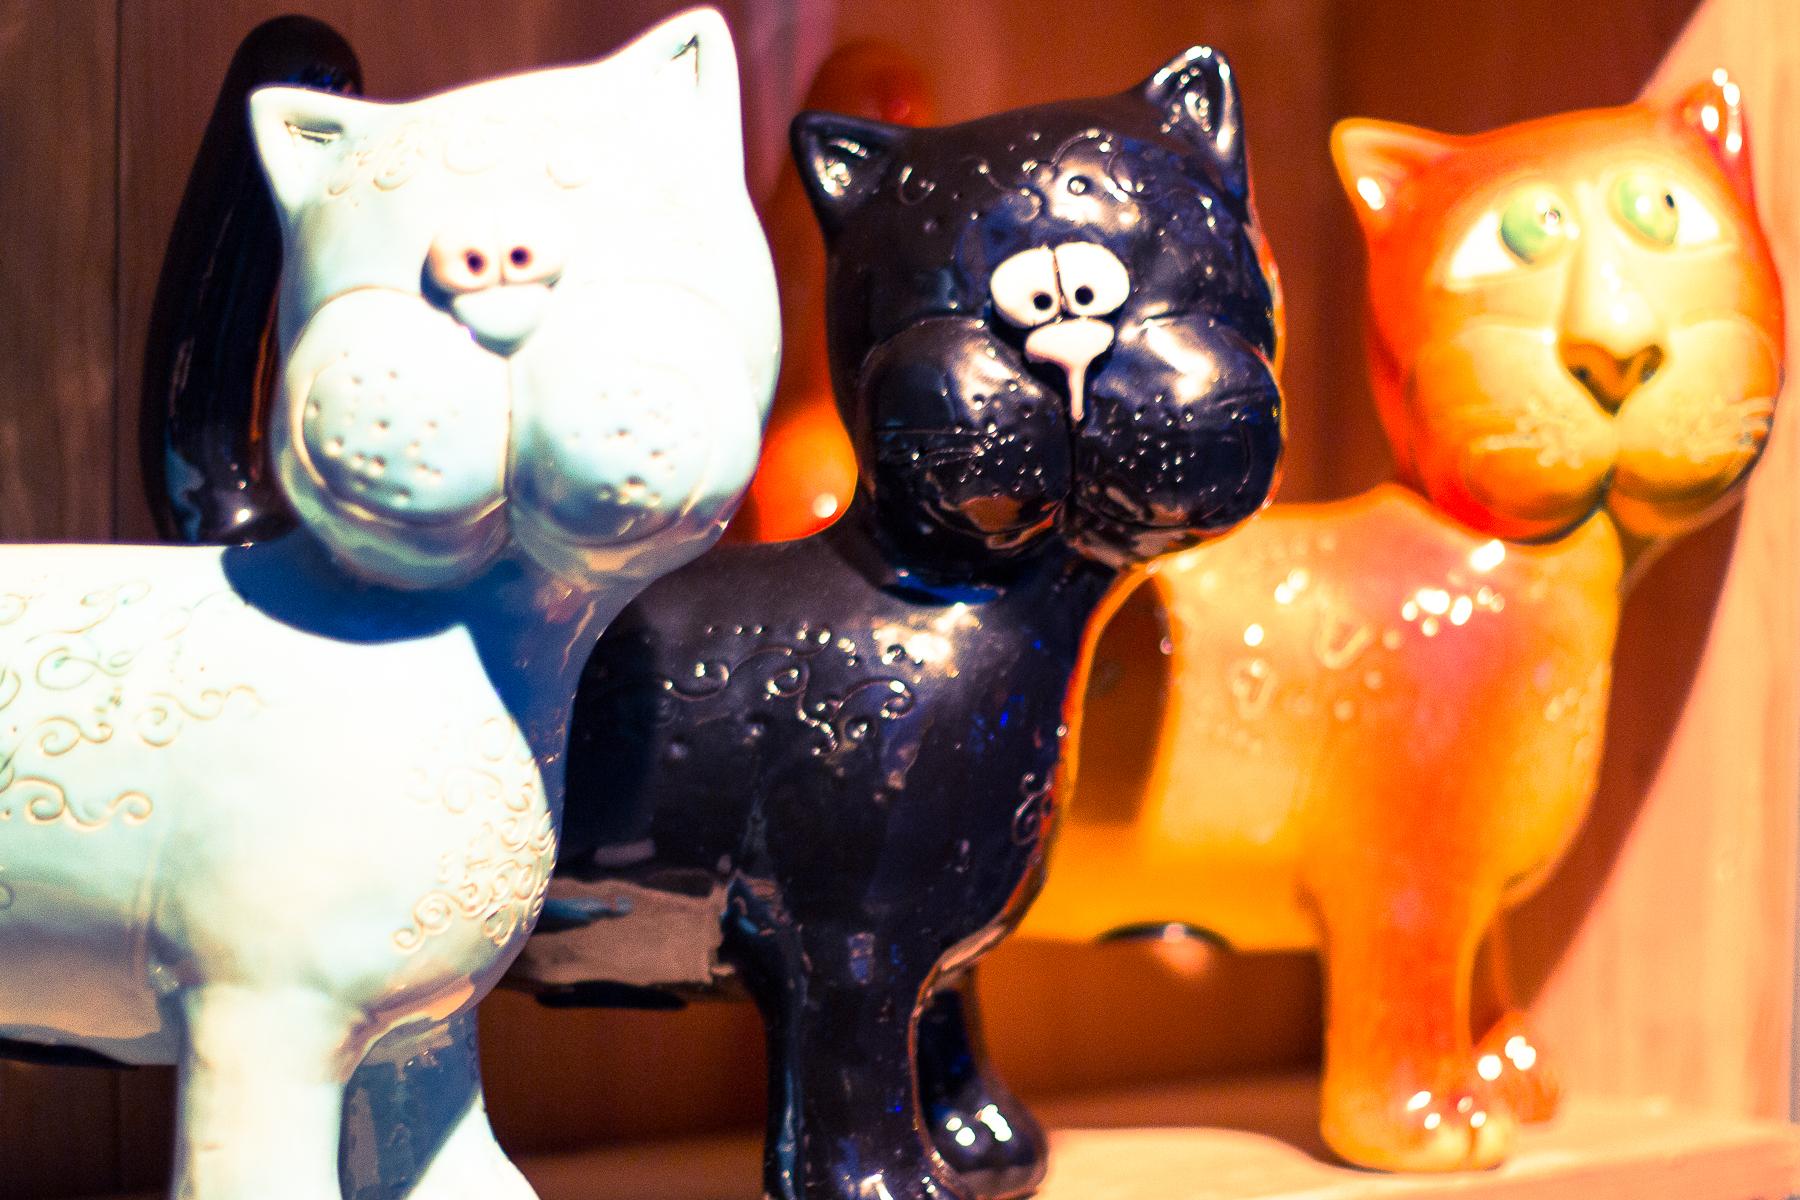 Cats Via @Atisgailis